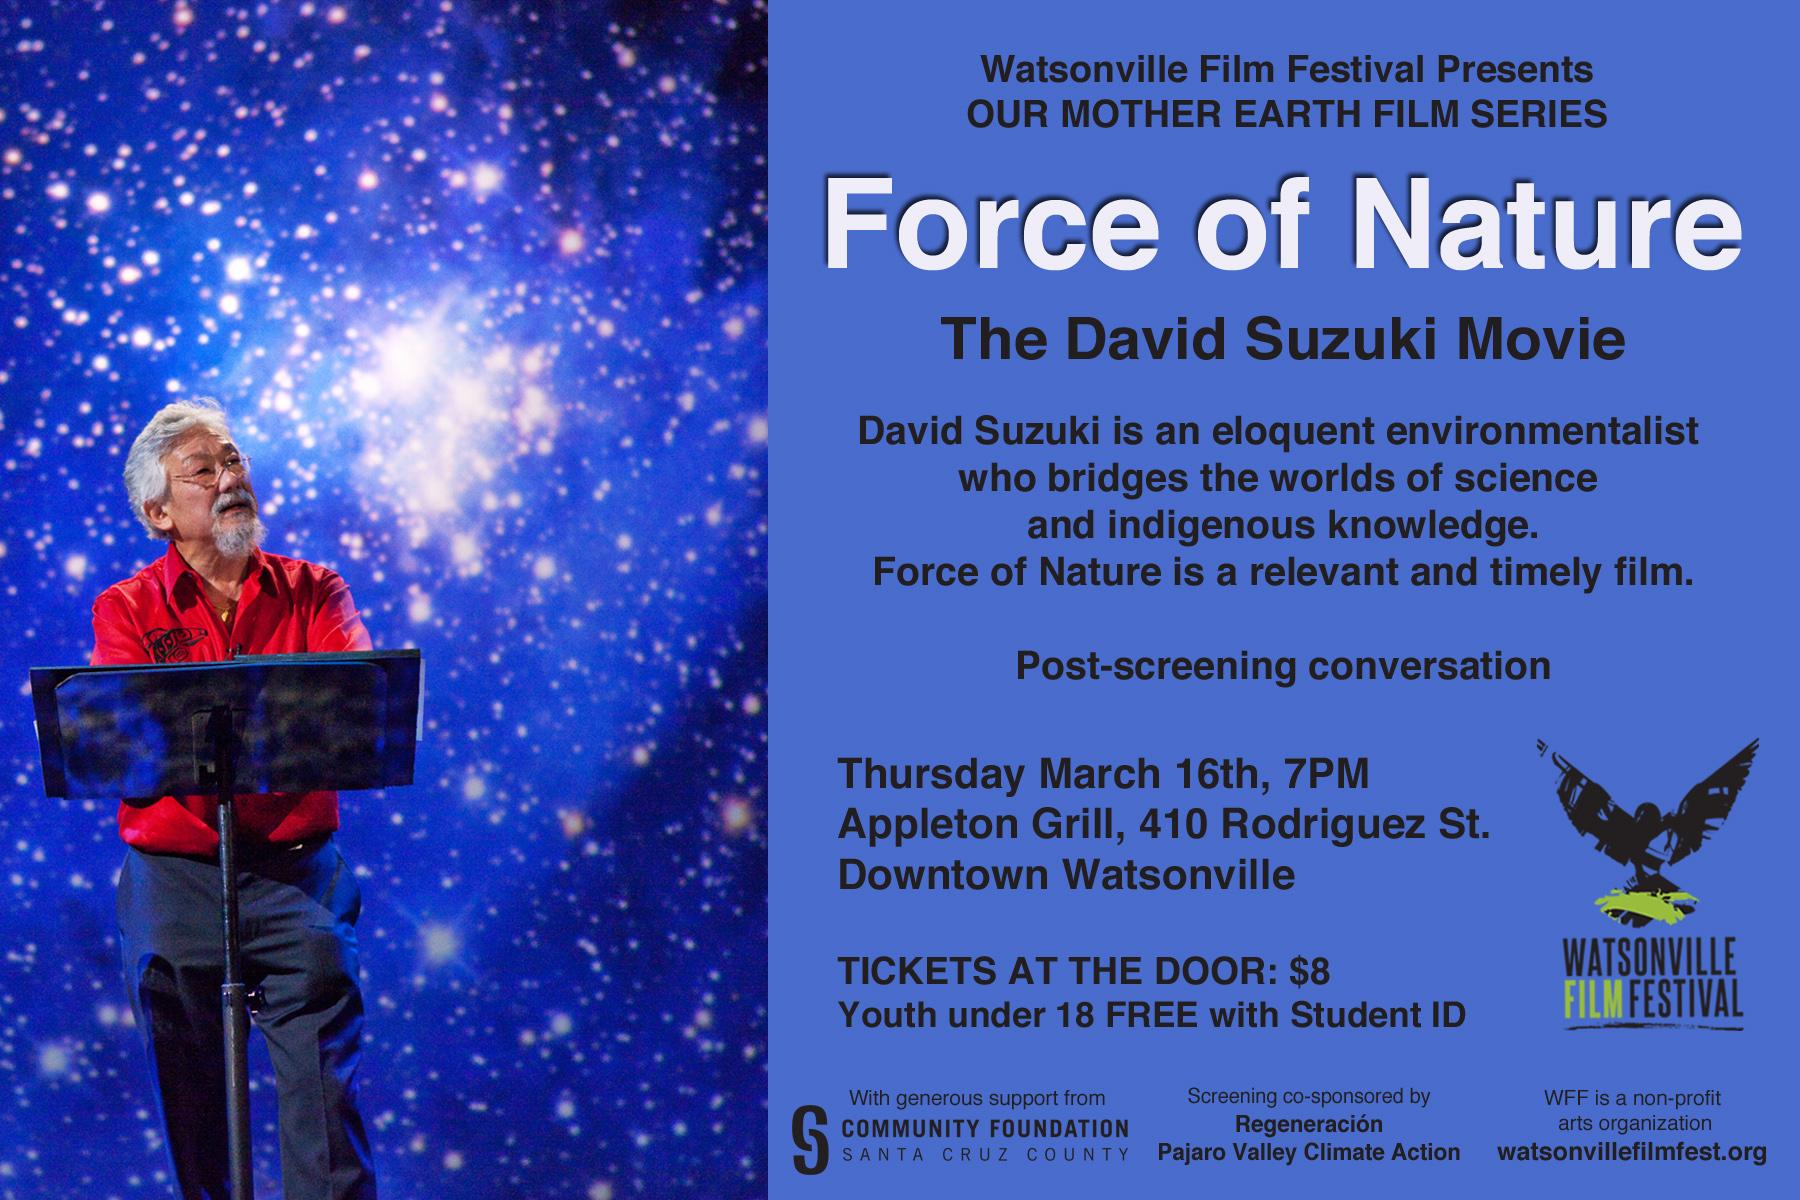 Force of Nature Postacard.jpg